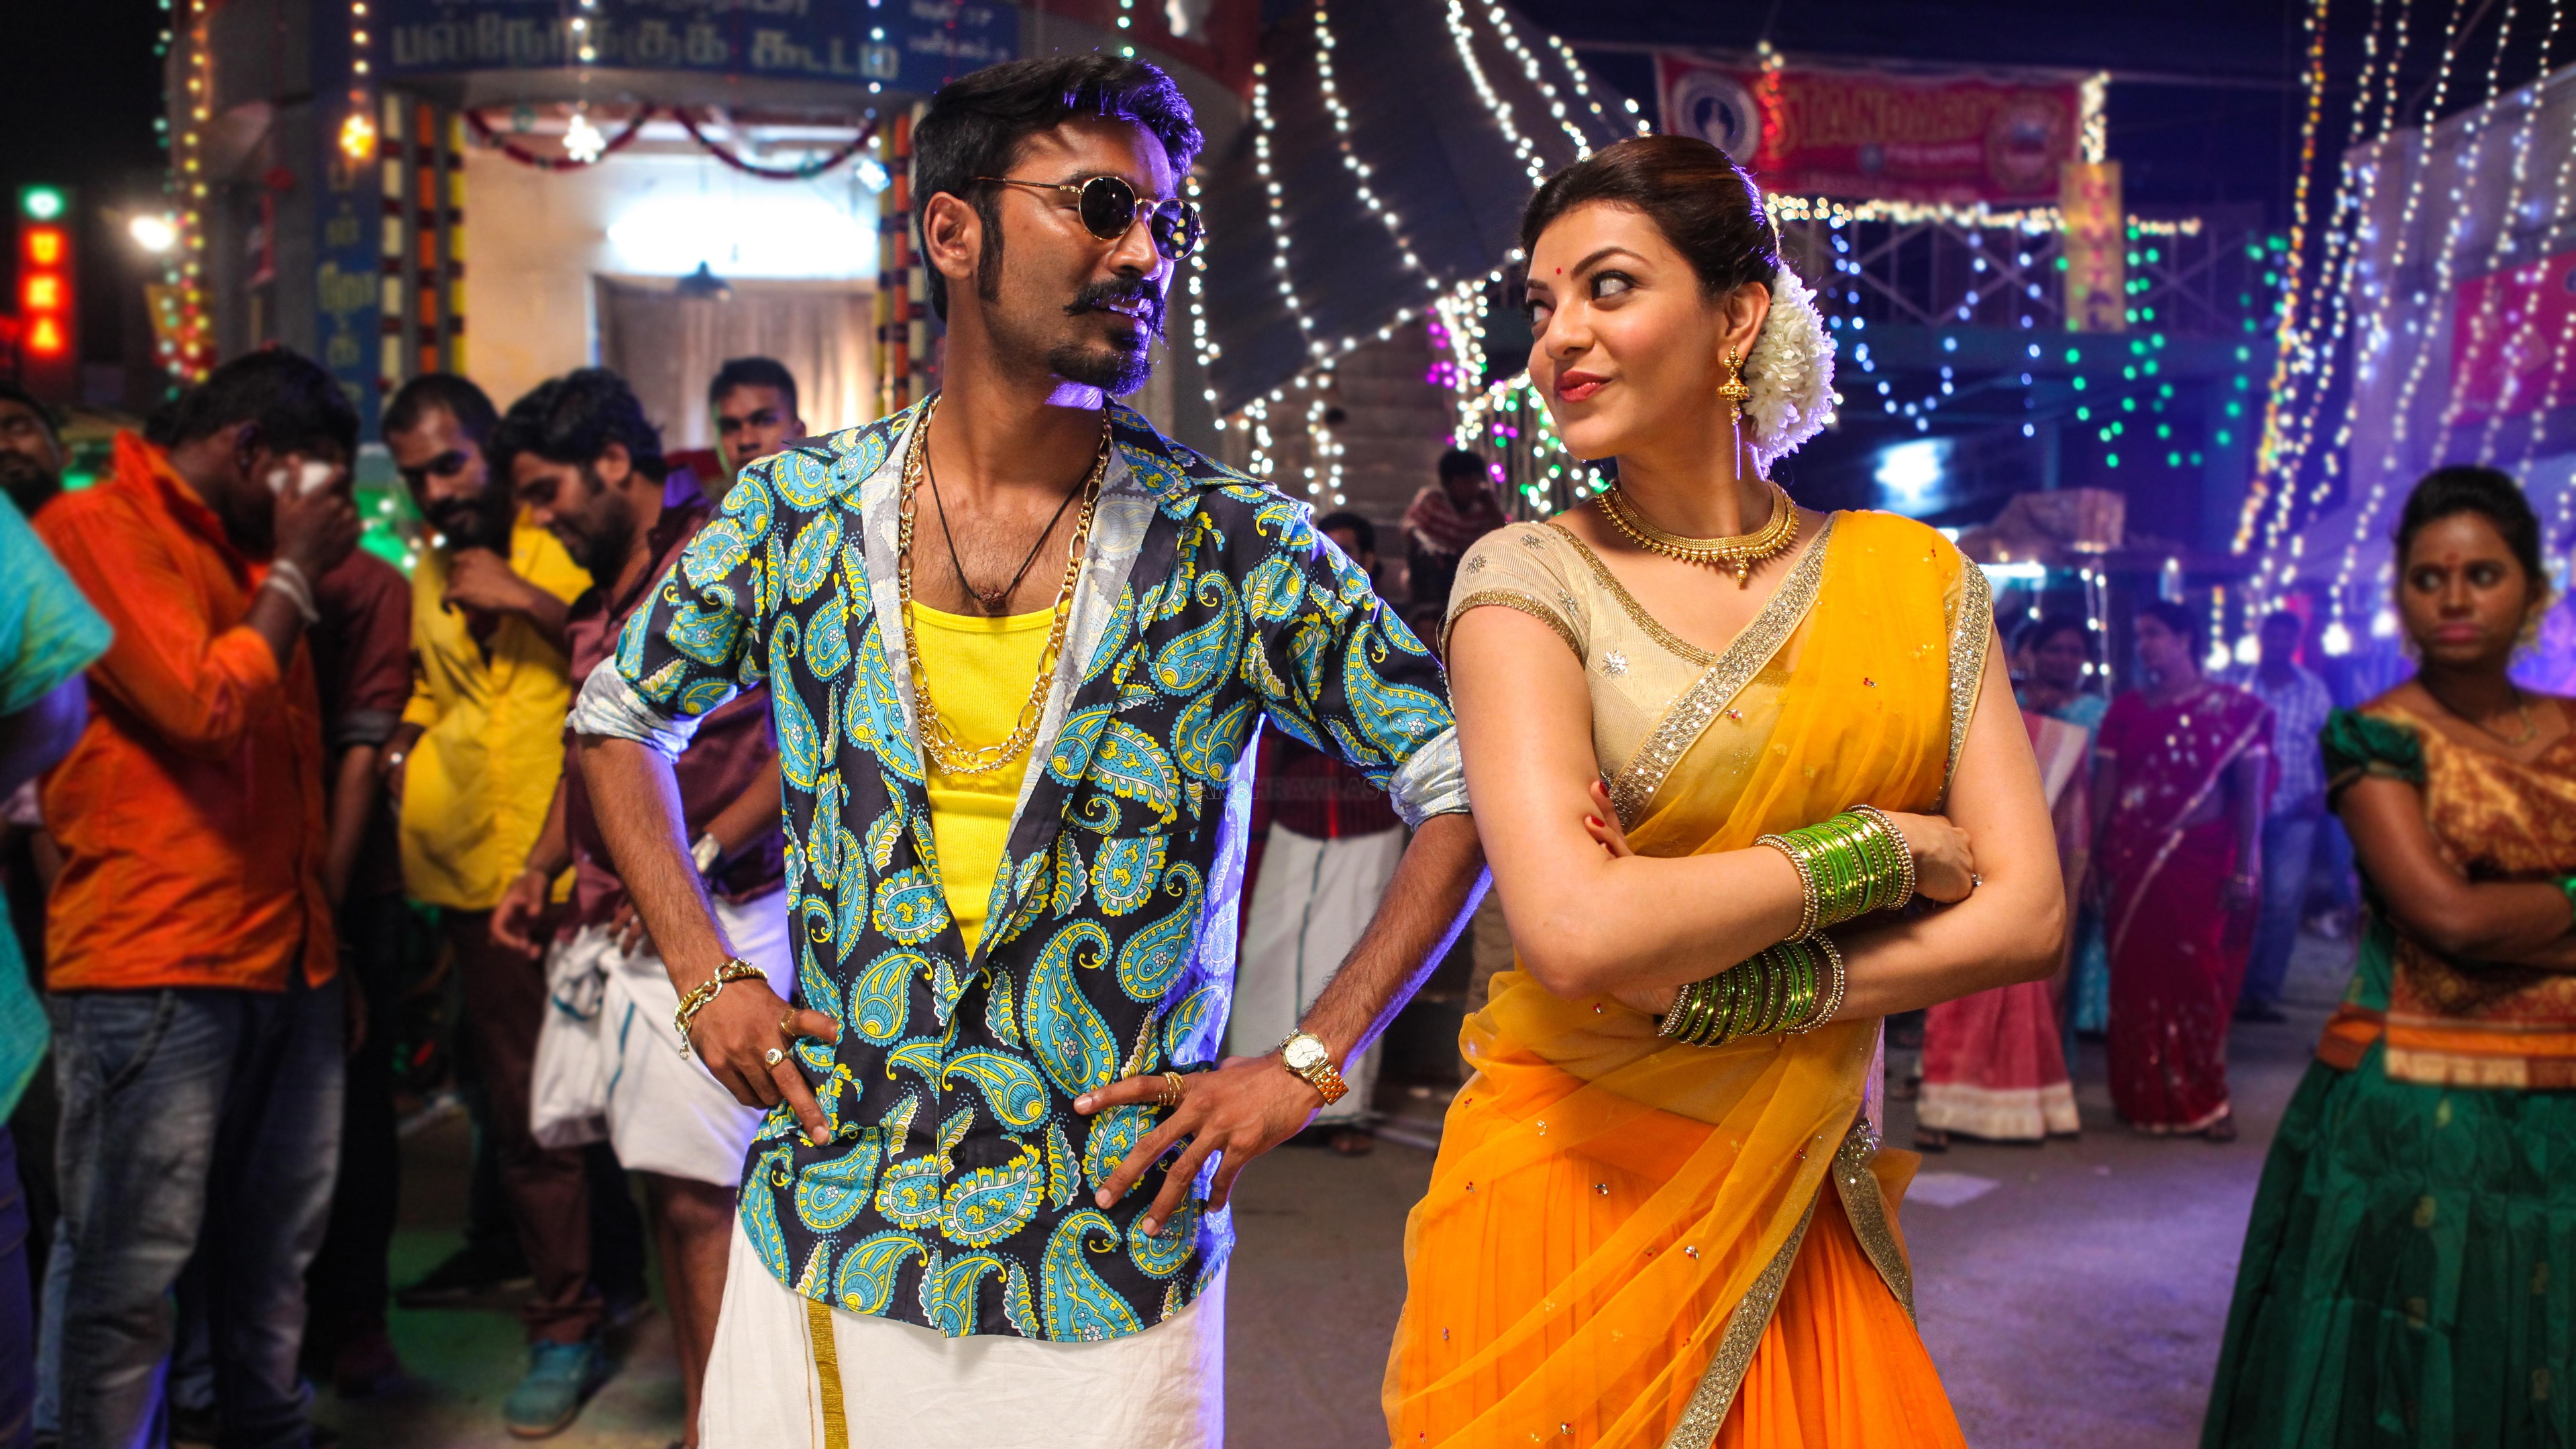 dhanush kajal maari tamil movie wallpapers in jpg format for free